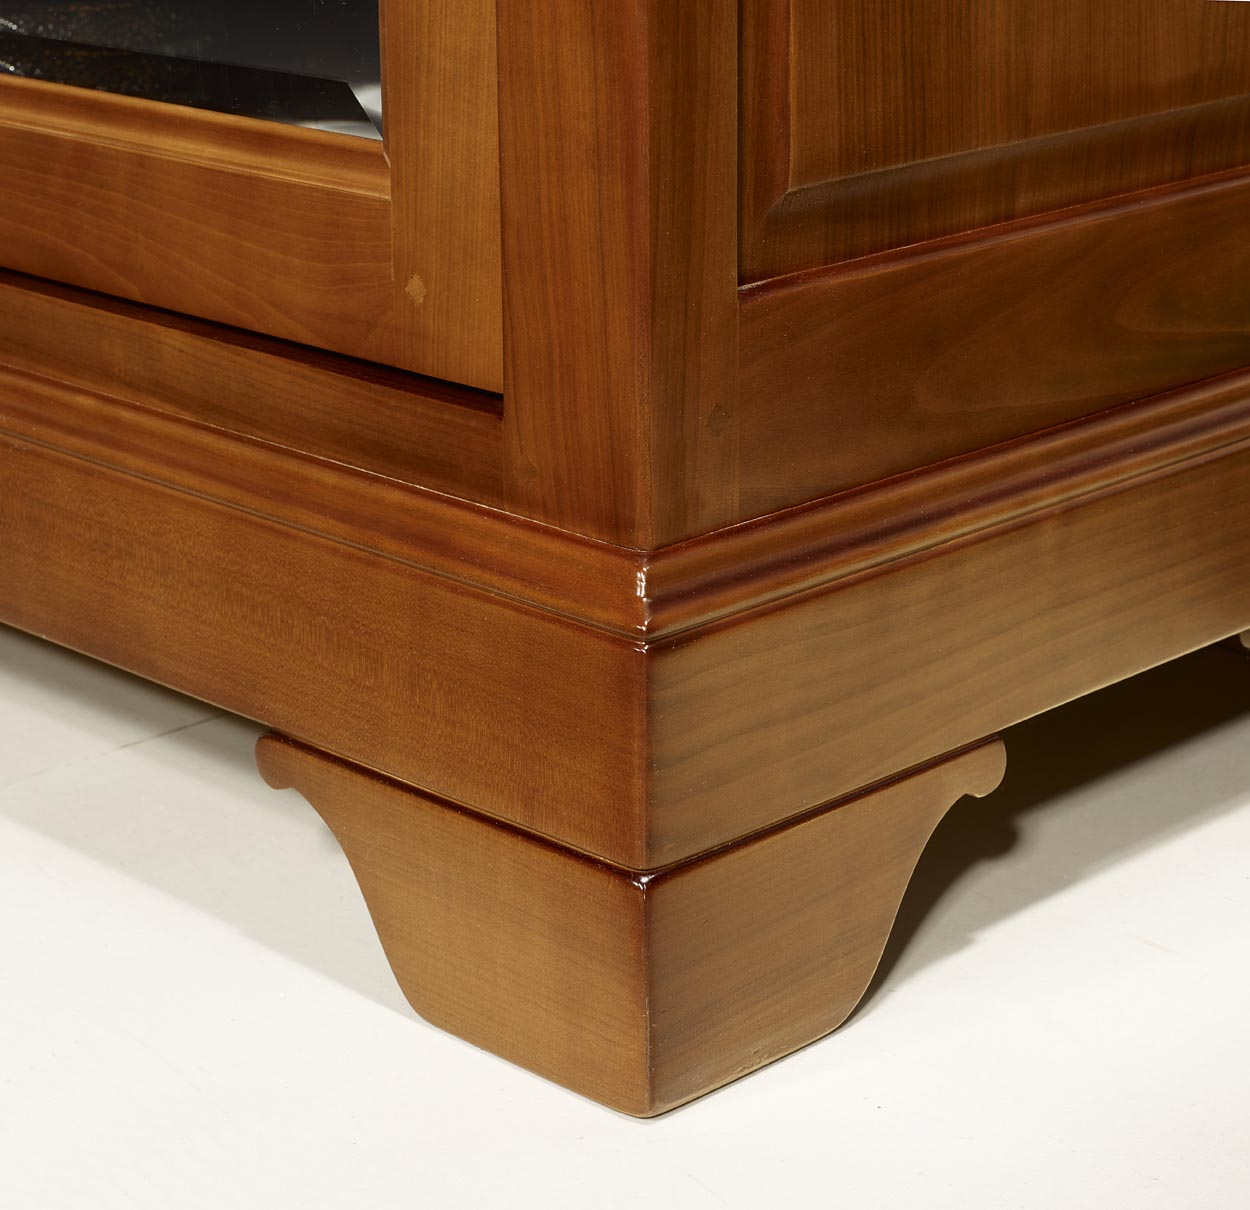 meuble tv 16 9eme e en merisier massif de style louis. Black Bedroom Furniture Sets. Home Design Ideas